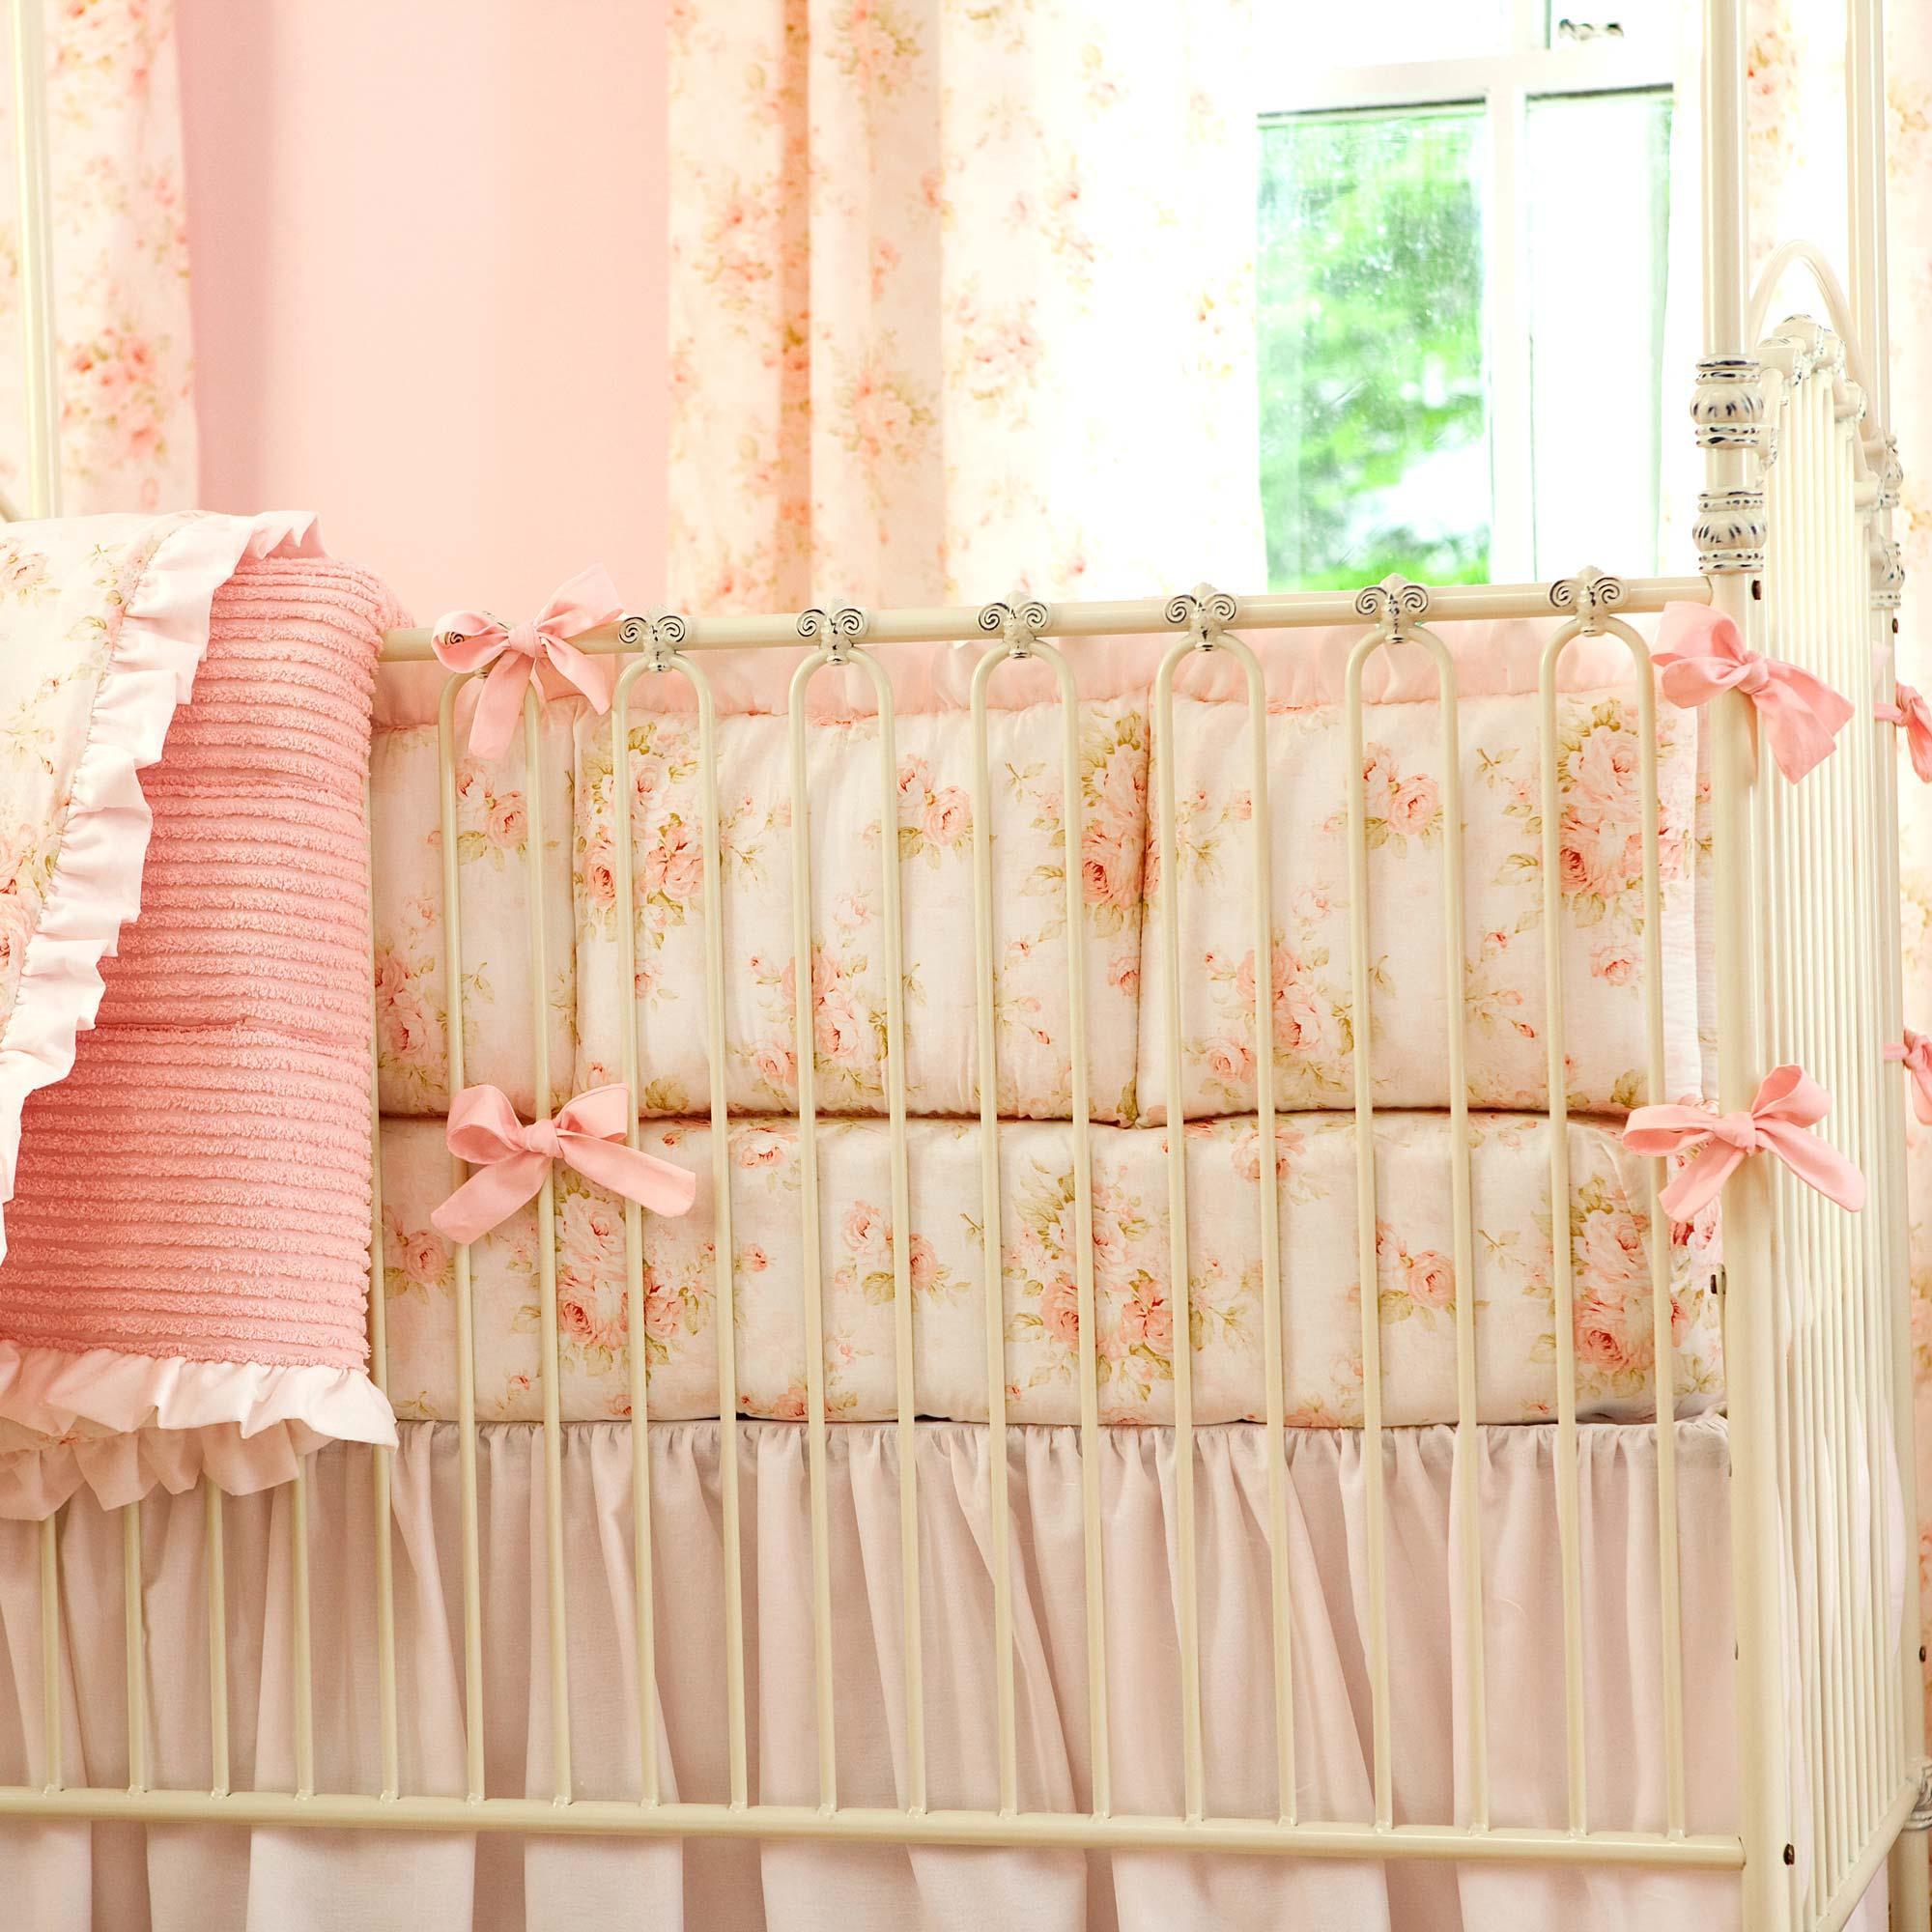 Babies R Us Elephant Bedding | Crib Bumpers | Breathable Mesh Bumper